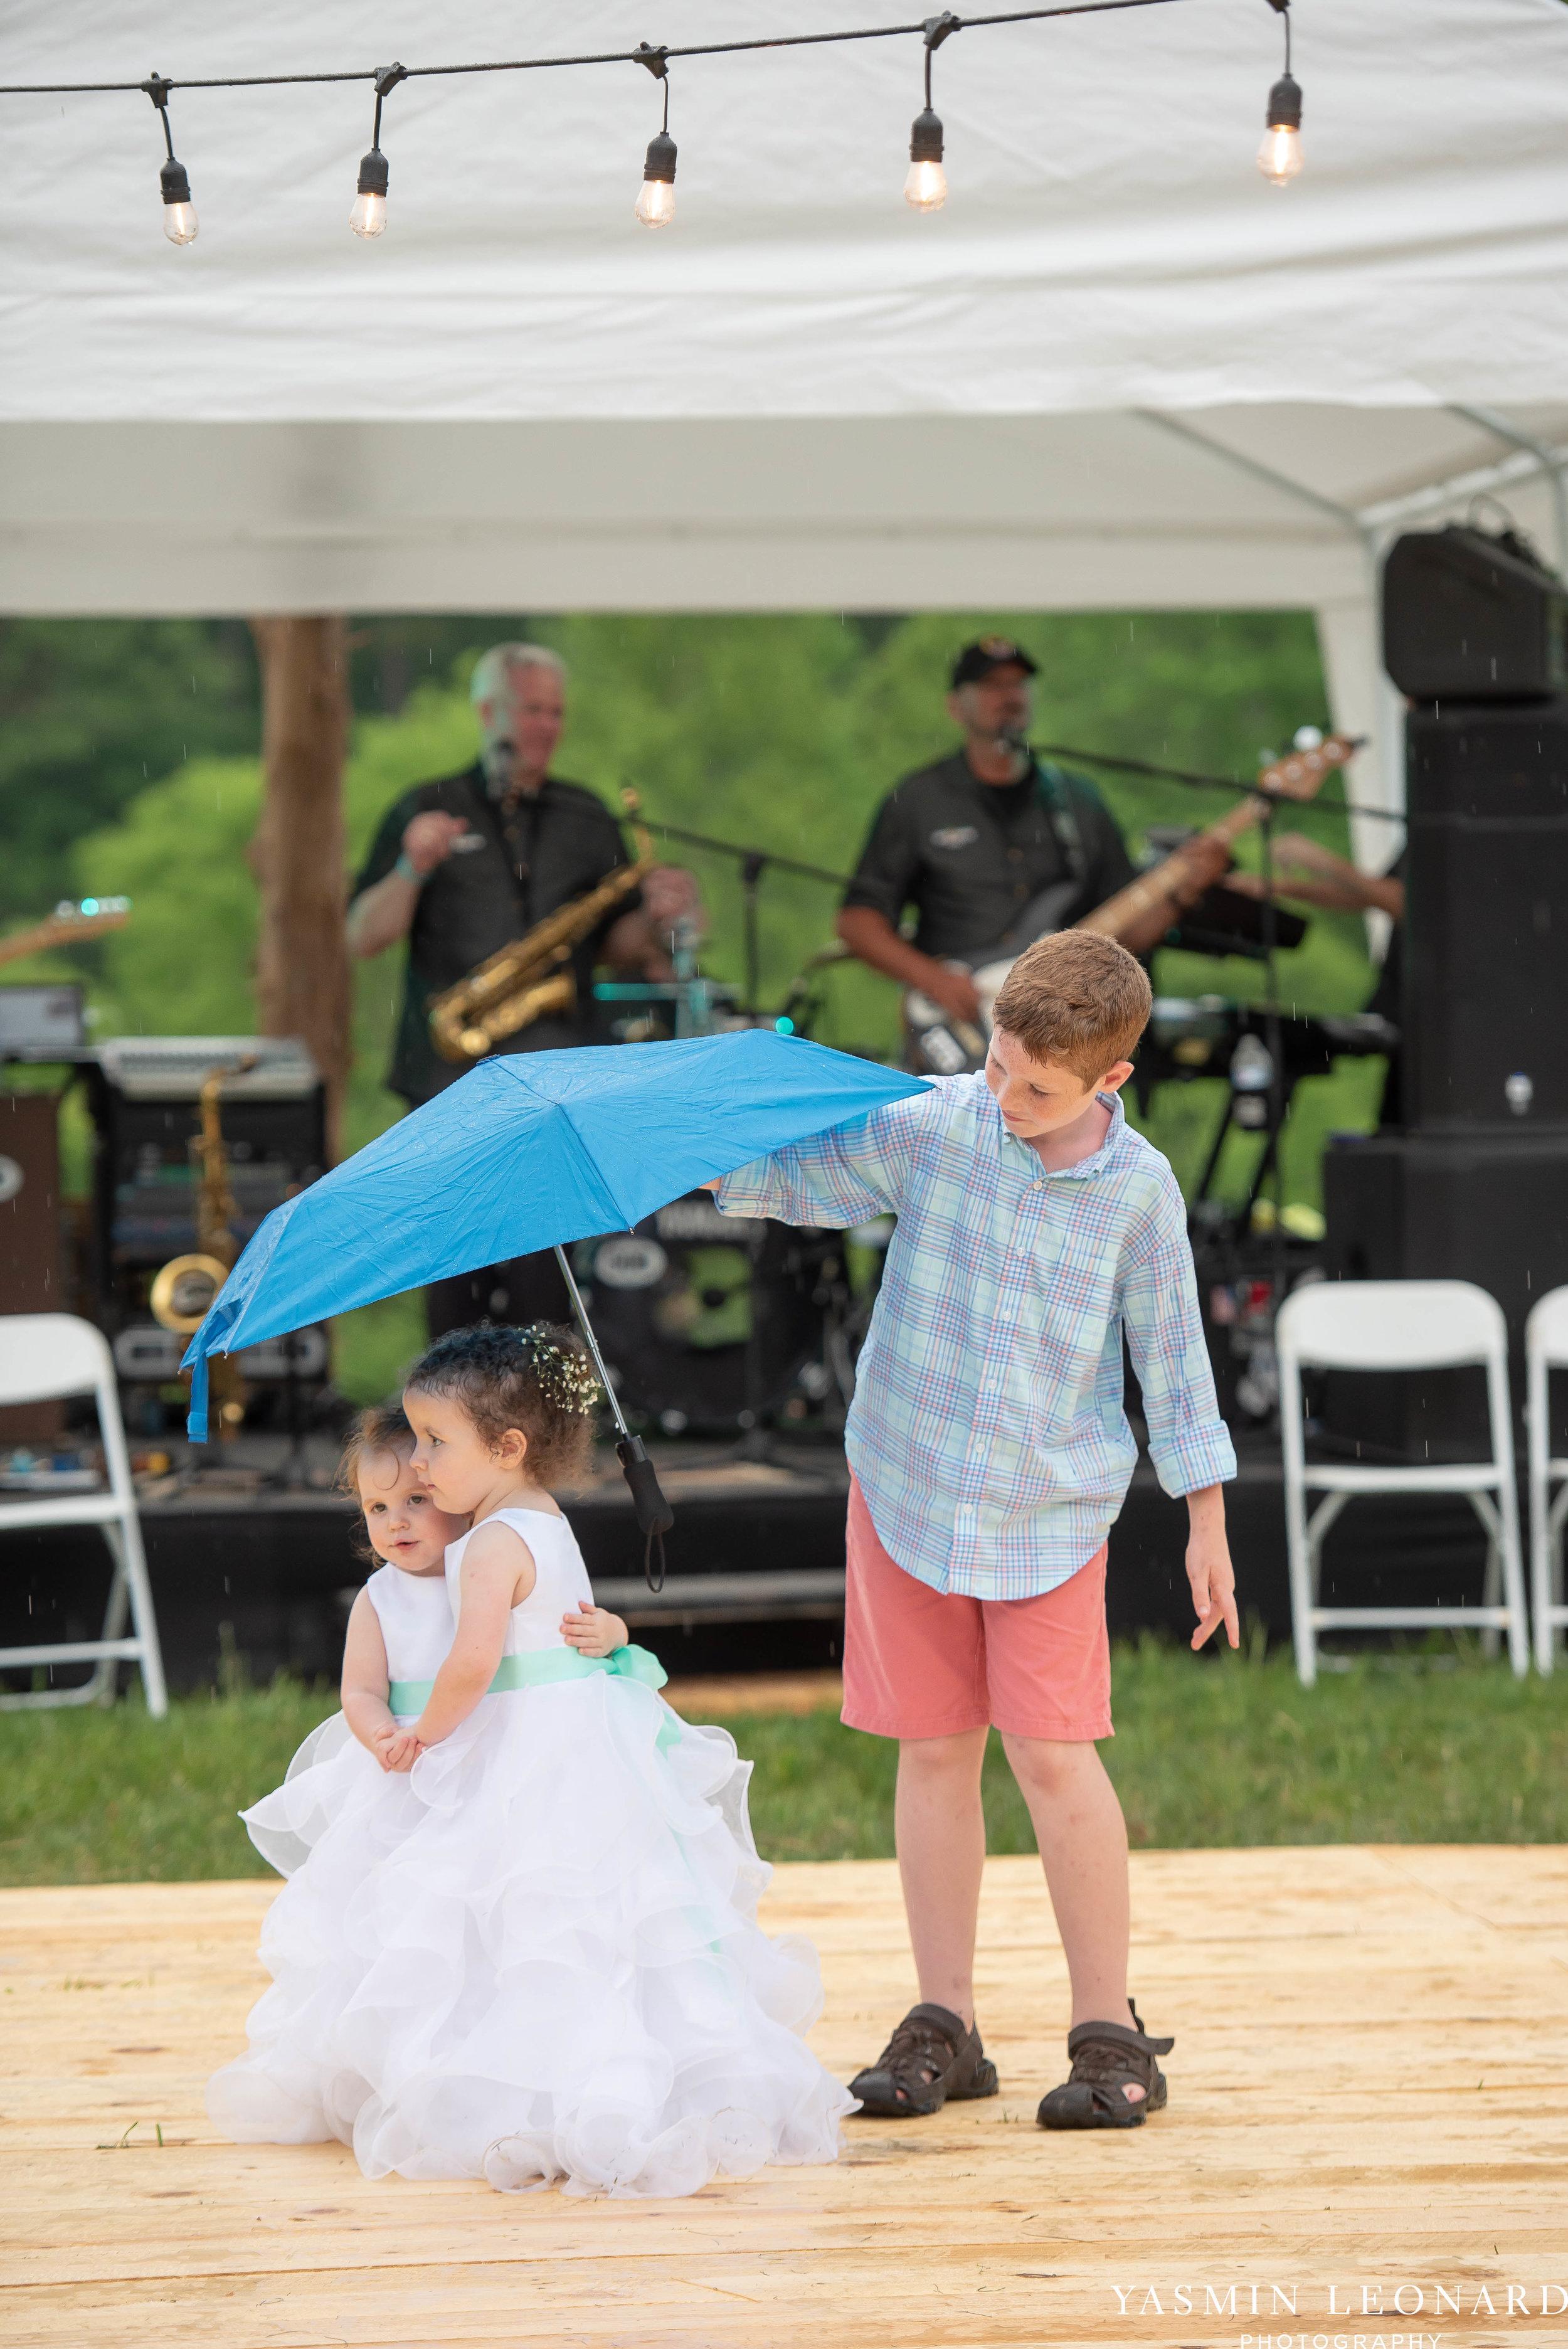 Rain on your wedding day - Rainy Wedding - Plan B for Rain - What to do if it rains on your wedding day - Wedding Inspiration - Outdoor wedding ideas - Rainy Wedding Pictures - Yasmin Leonard Photography-63.jpg